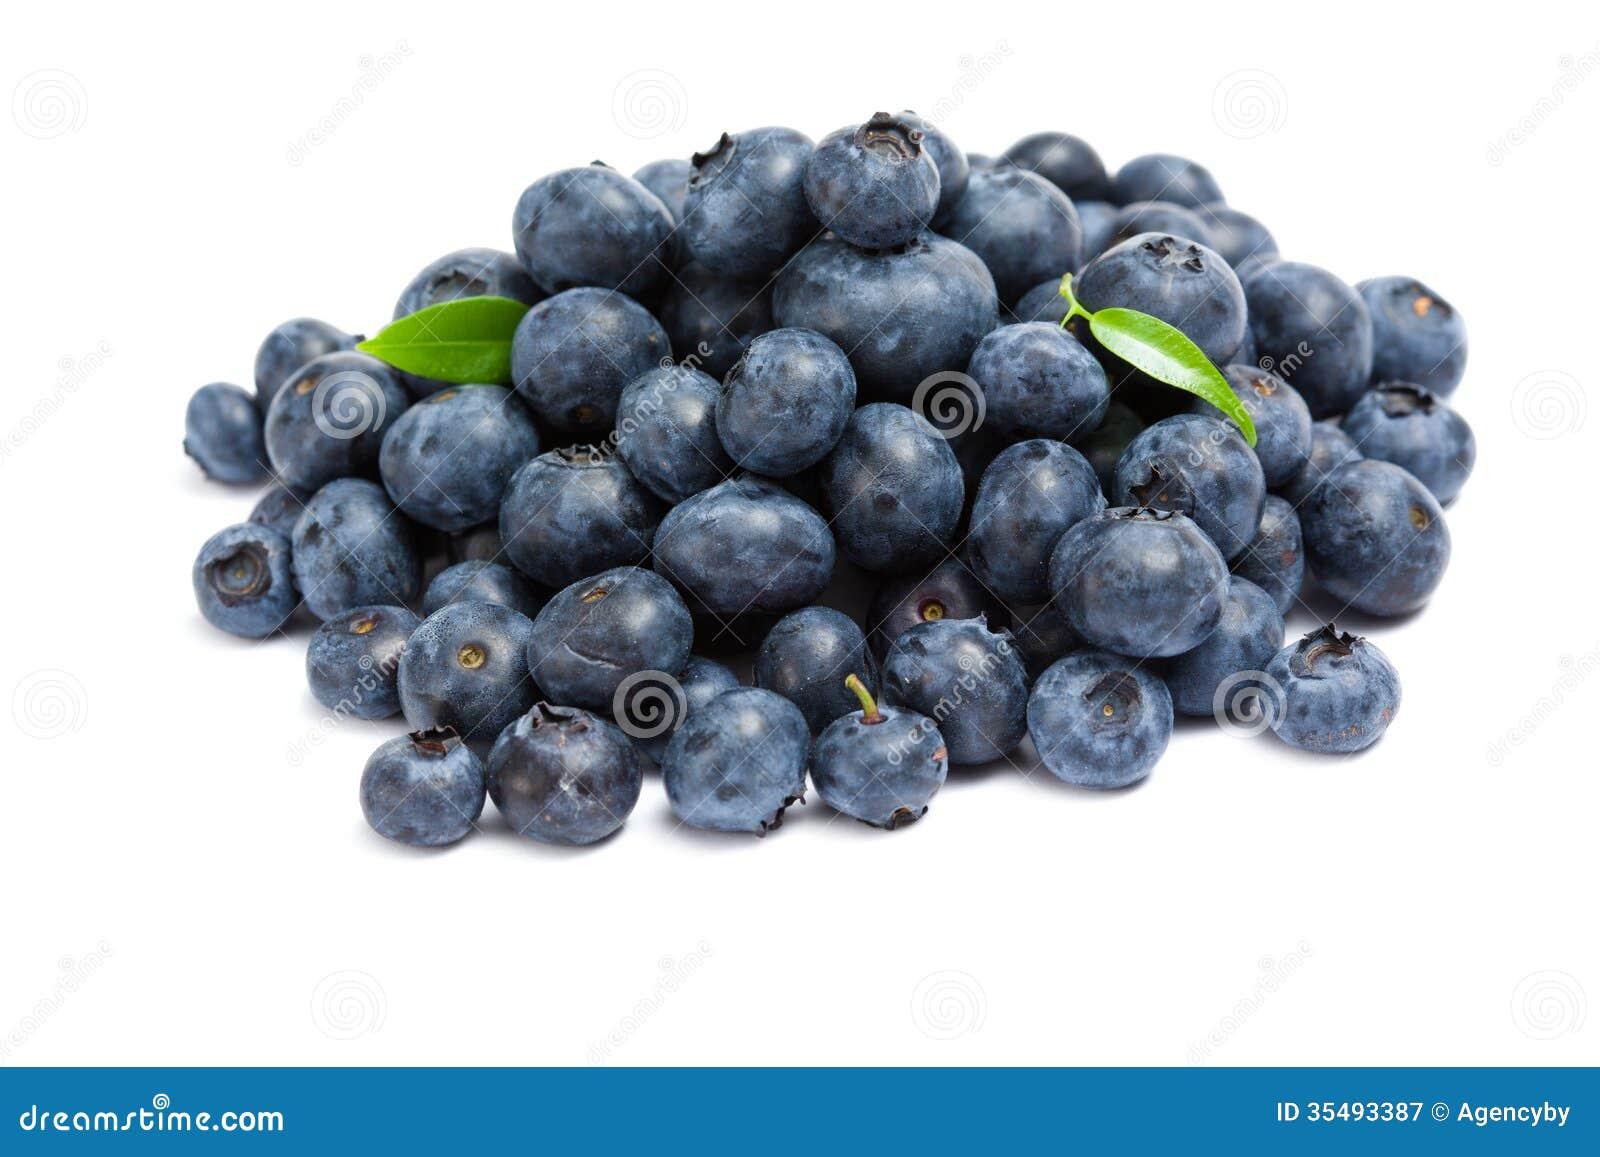 Close up shot of heap of bilberry